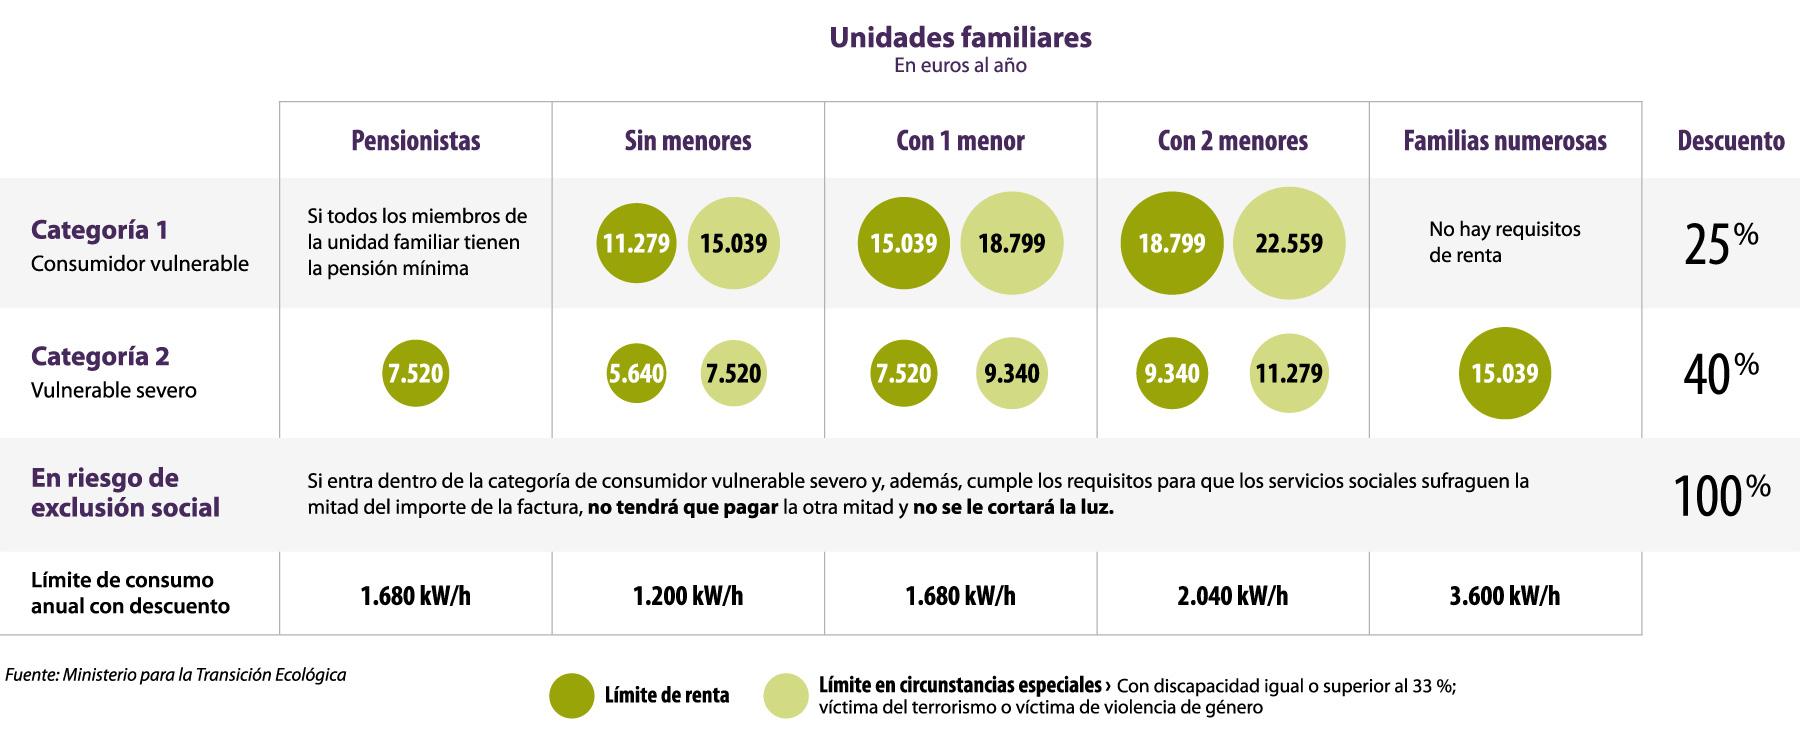 bono social unidades familiares